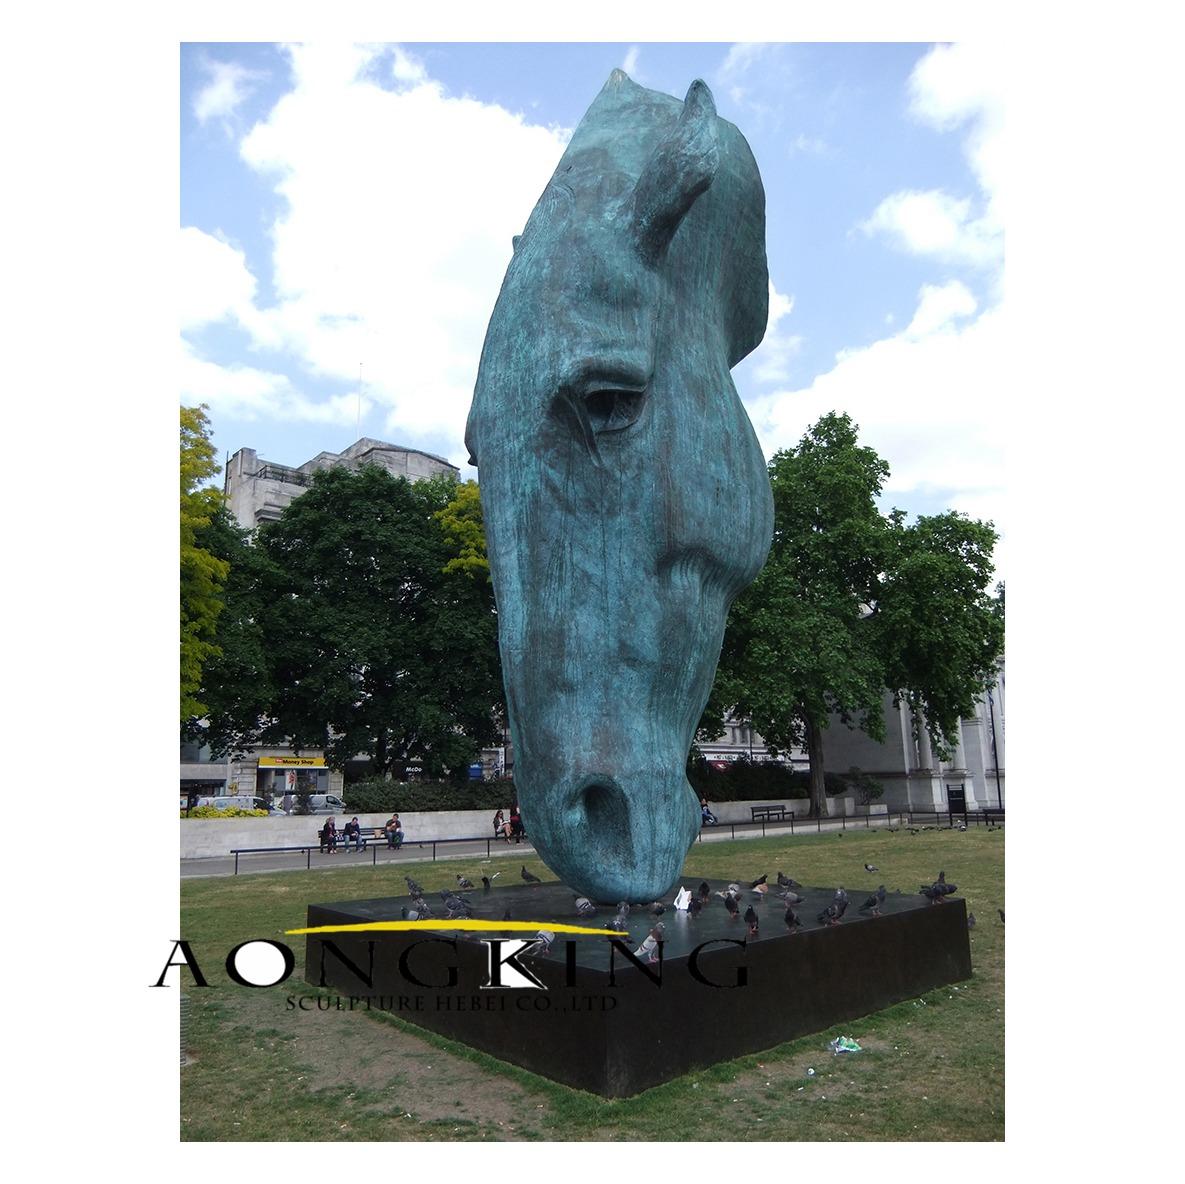 Sculpture of horse's head